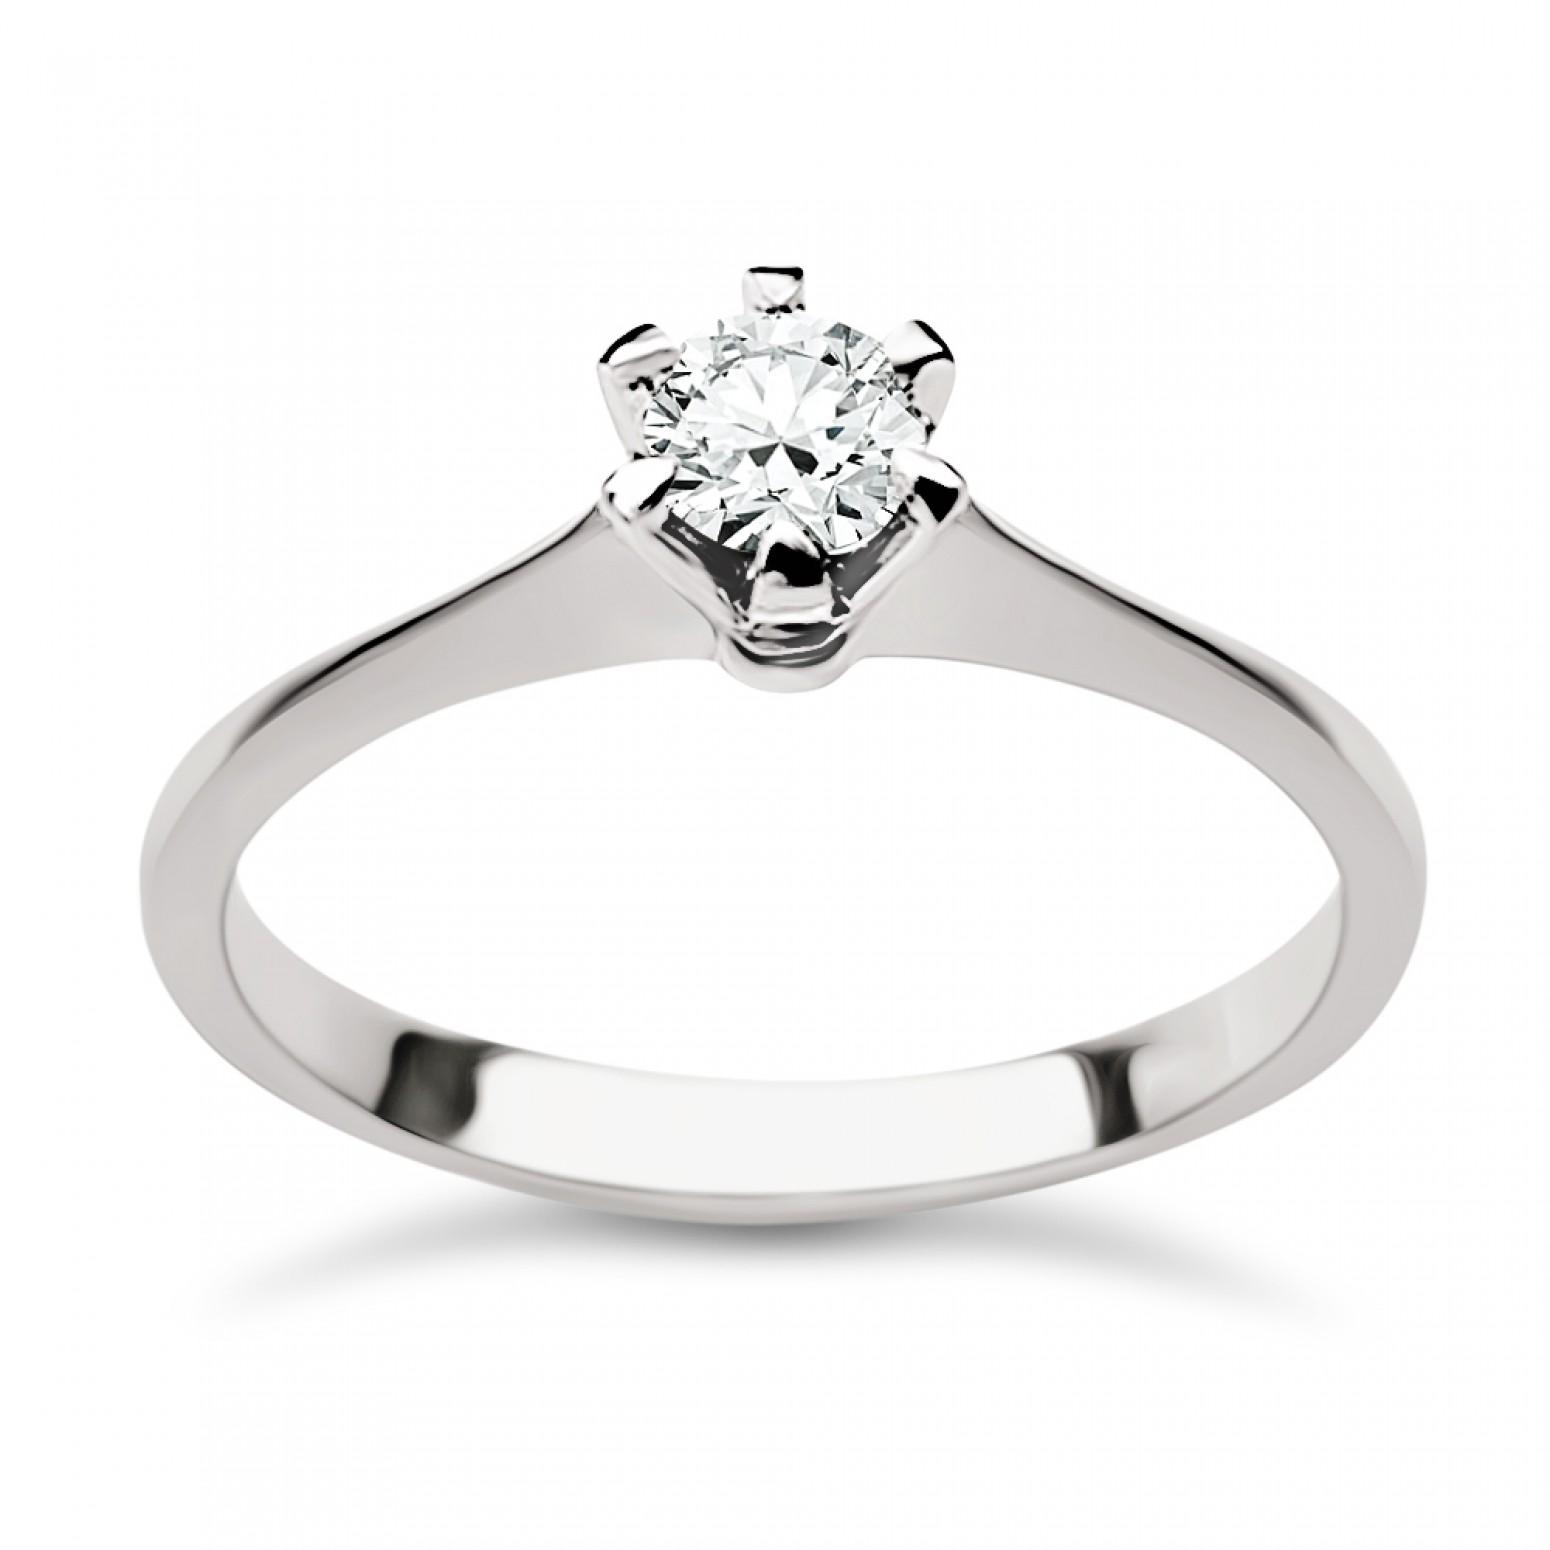 Solitaire ring 18K white gold with diamond 0.21ct, VS1, G from IGL da3865 ENGAGEMENT RINGS Κοσμηματα - chrilia.gr